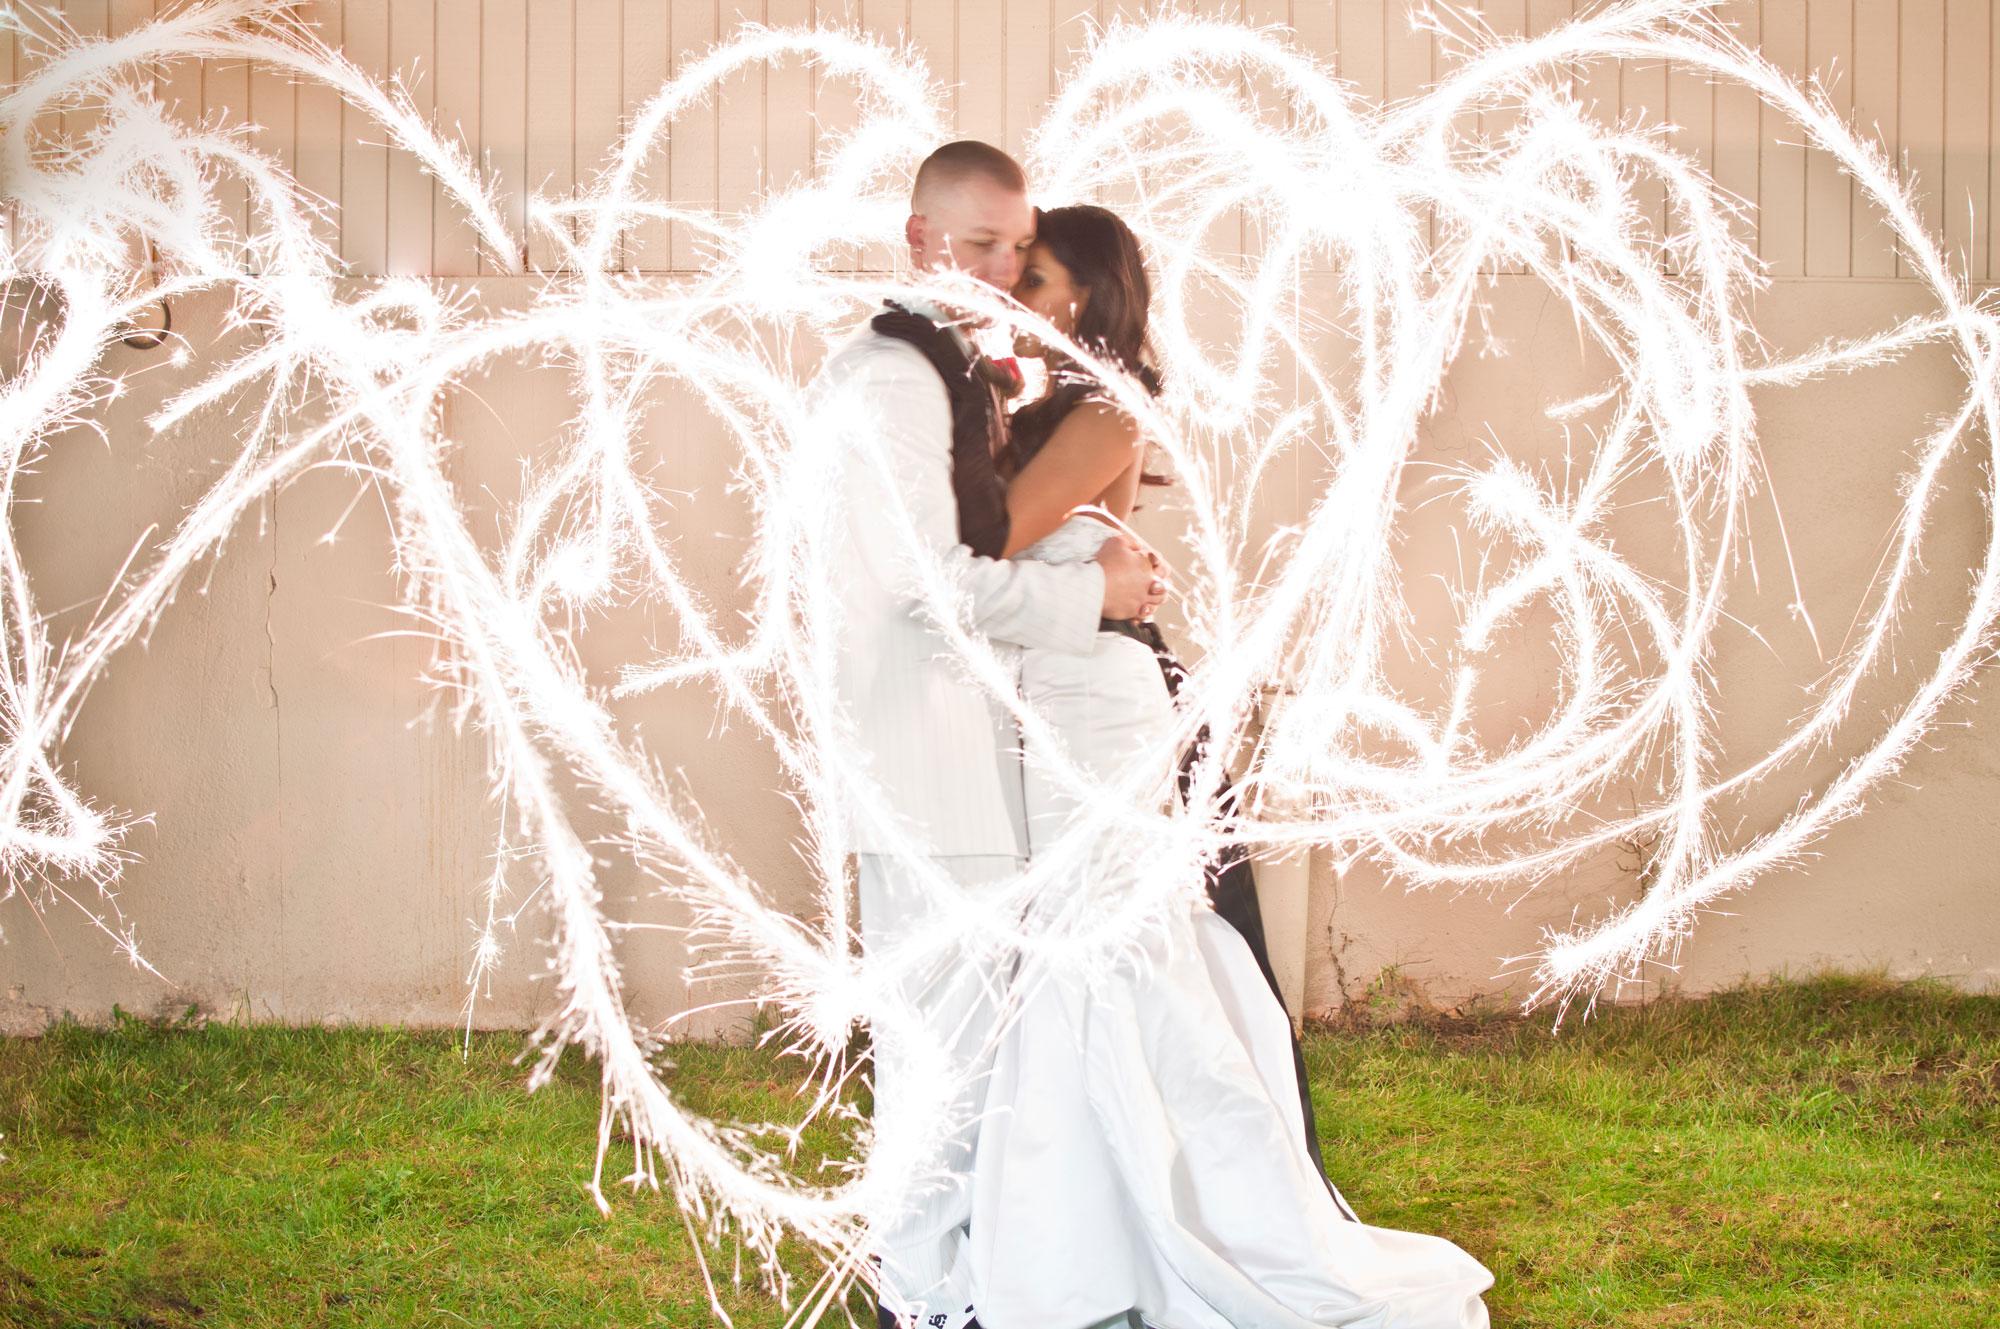 Wedding sparklers